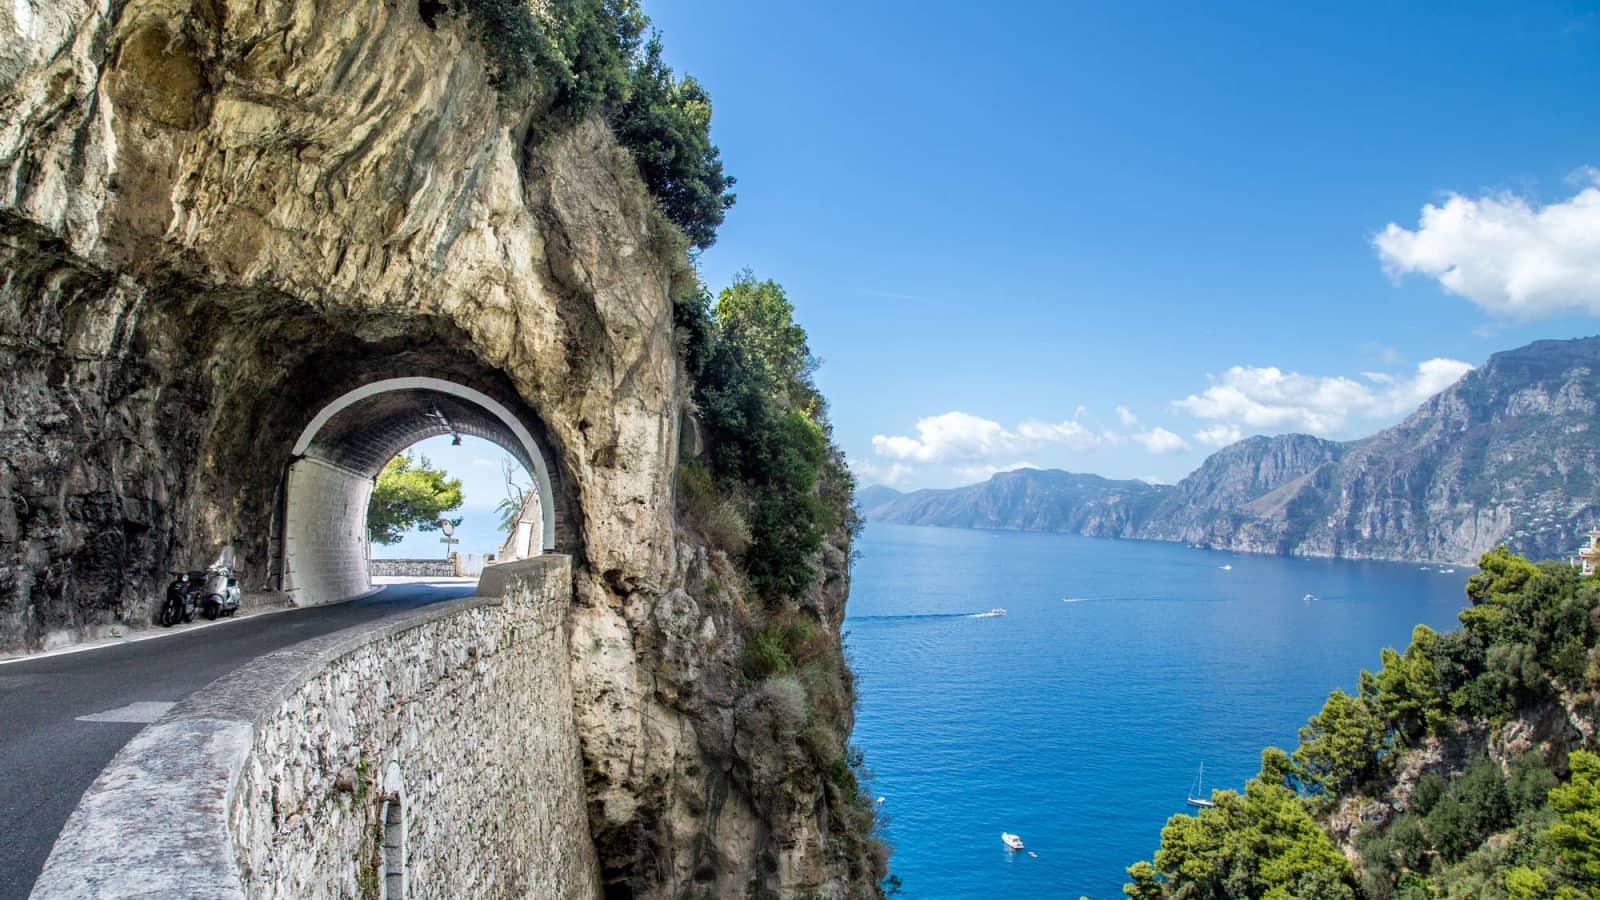 Sorrento Amp The Amalfi Coast Holidays 2018 Topflight